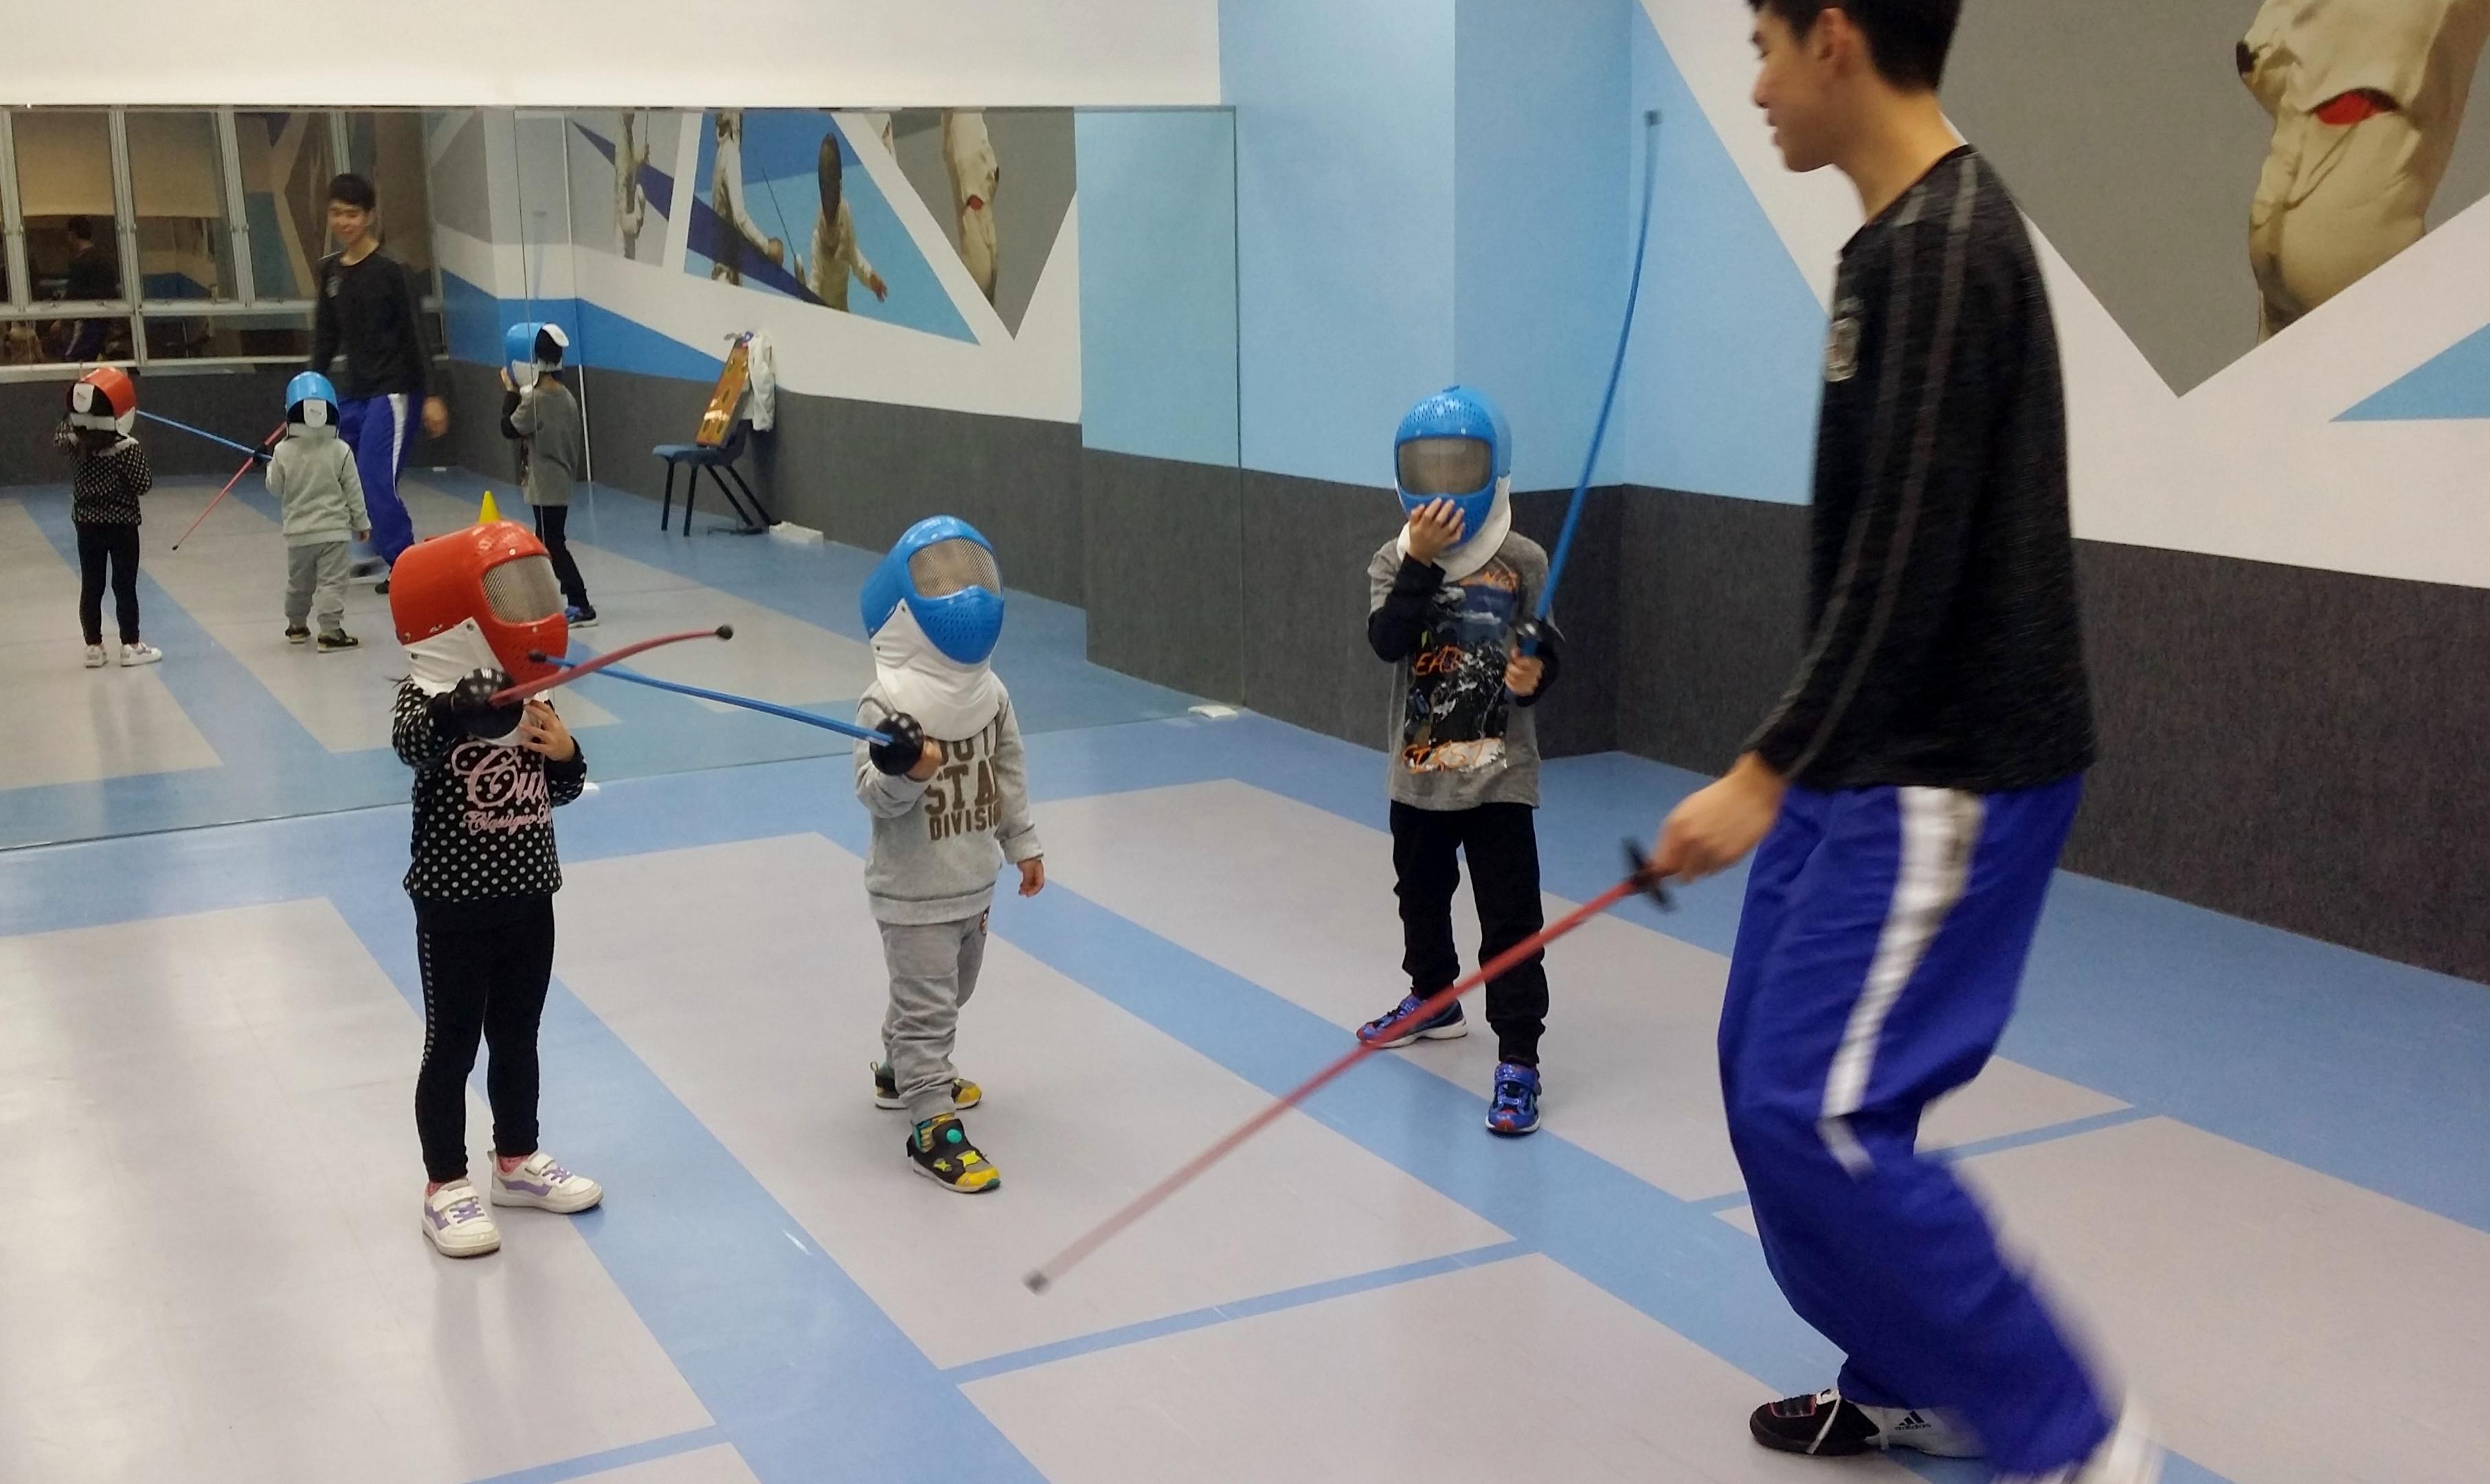 Children Fencing Class